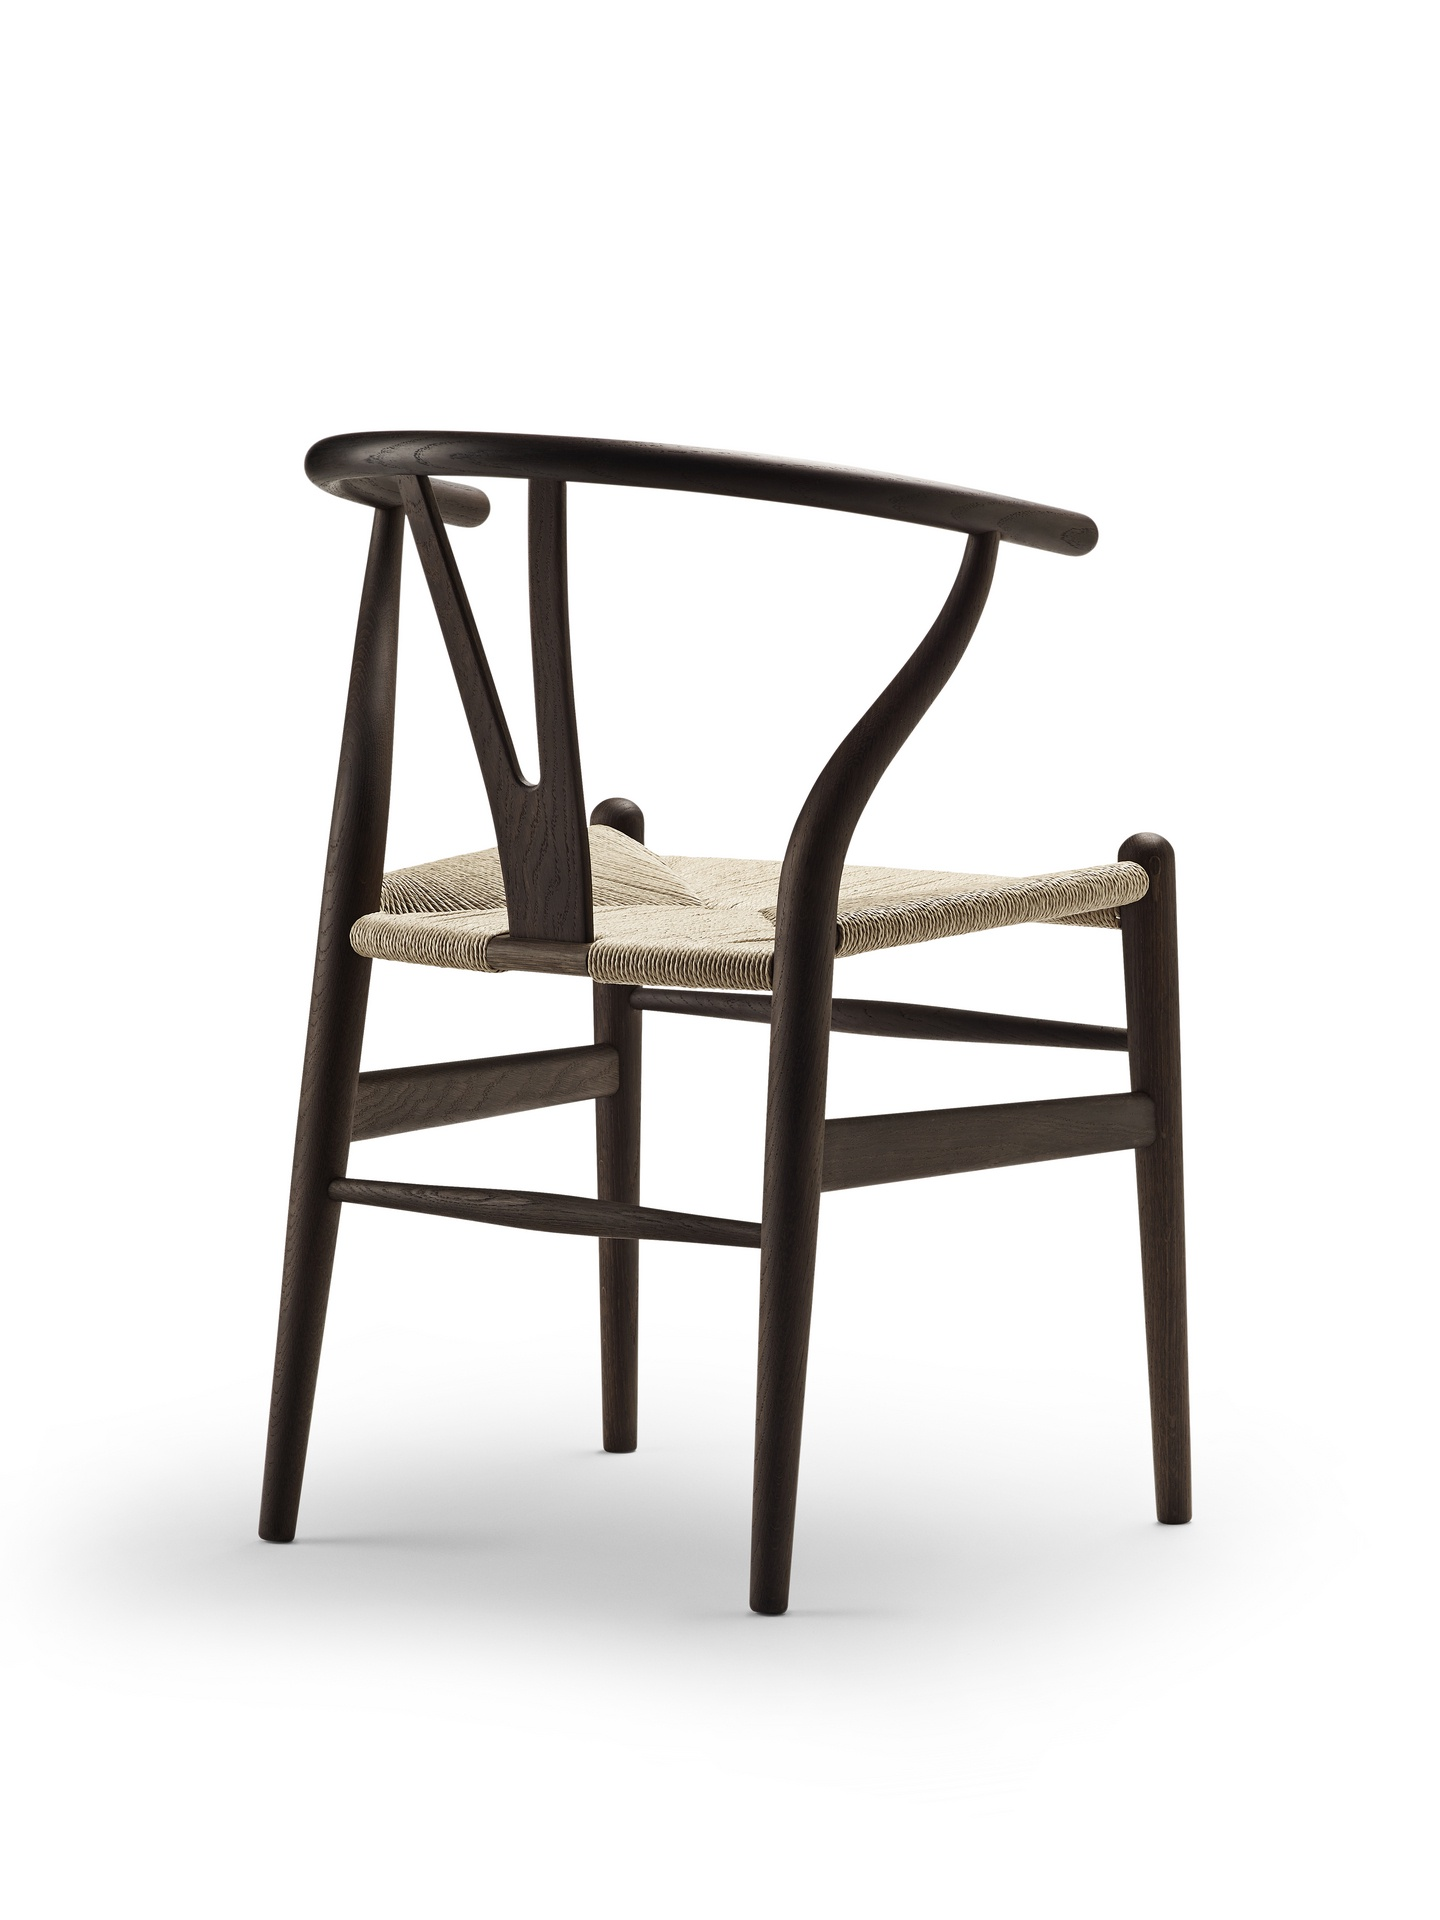 Danish Design Since 1908 Carl Hansen Søn